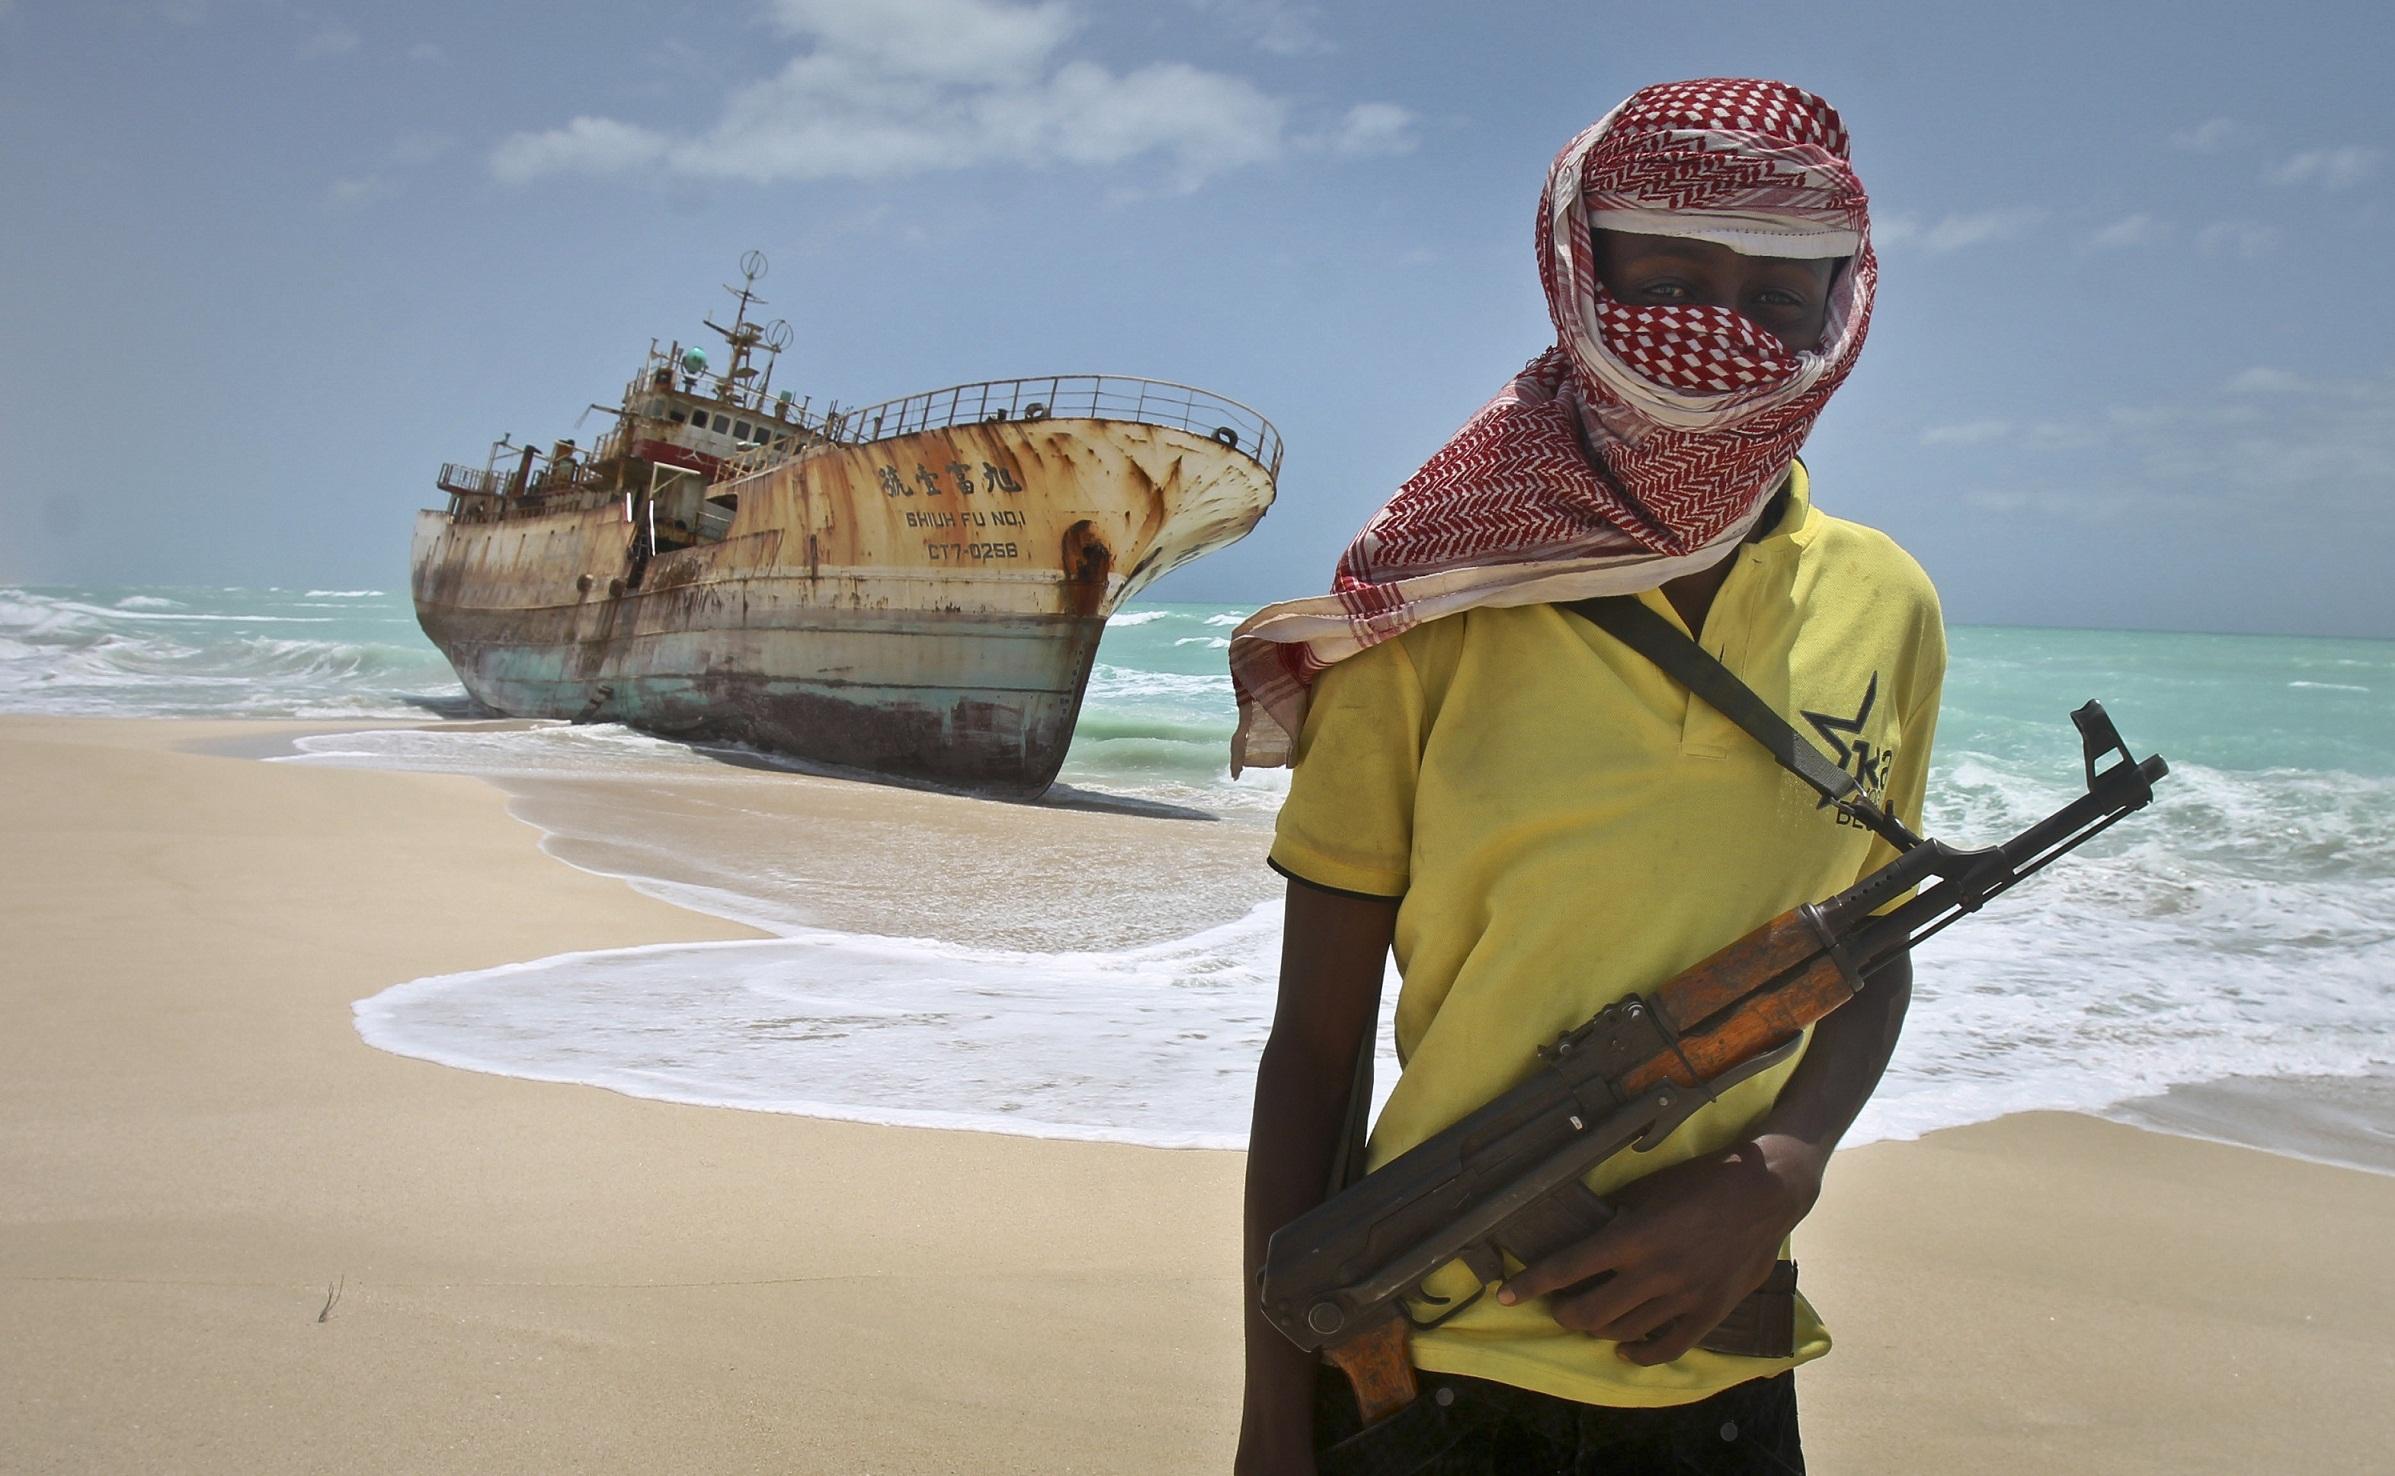 Somalia End of Piracy